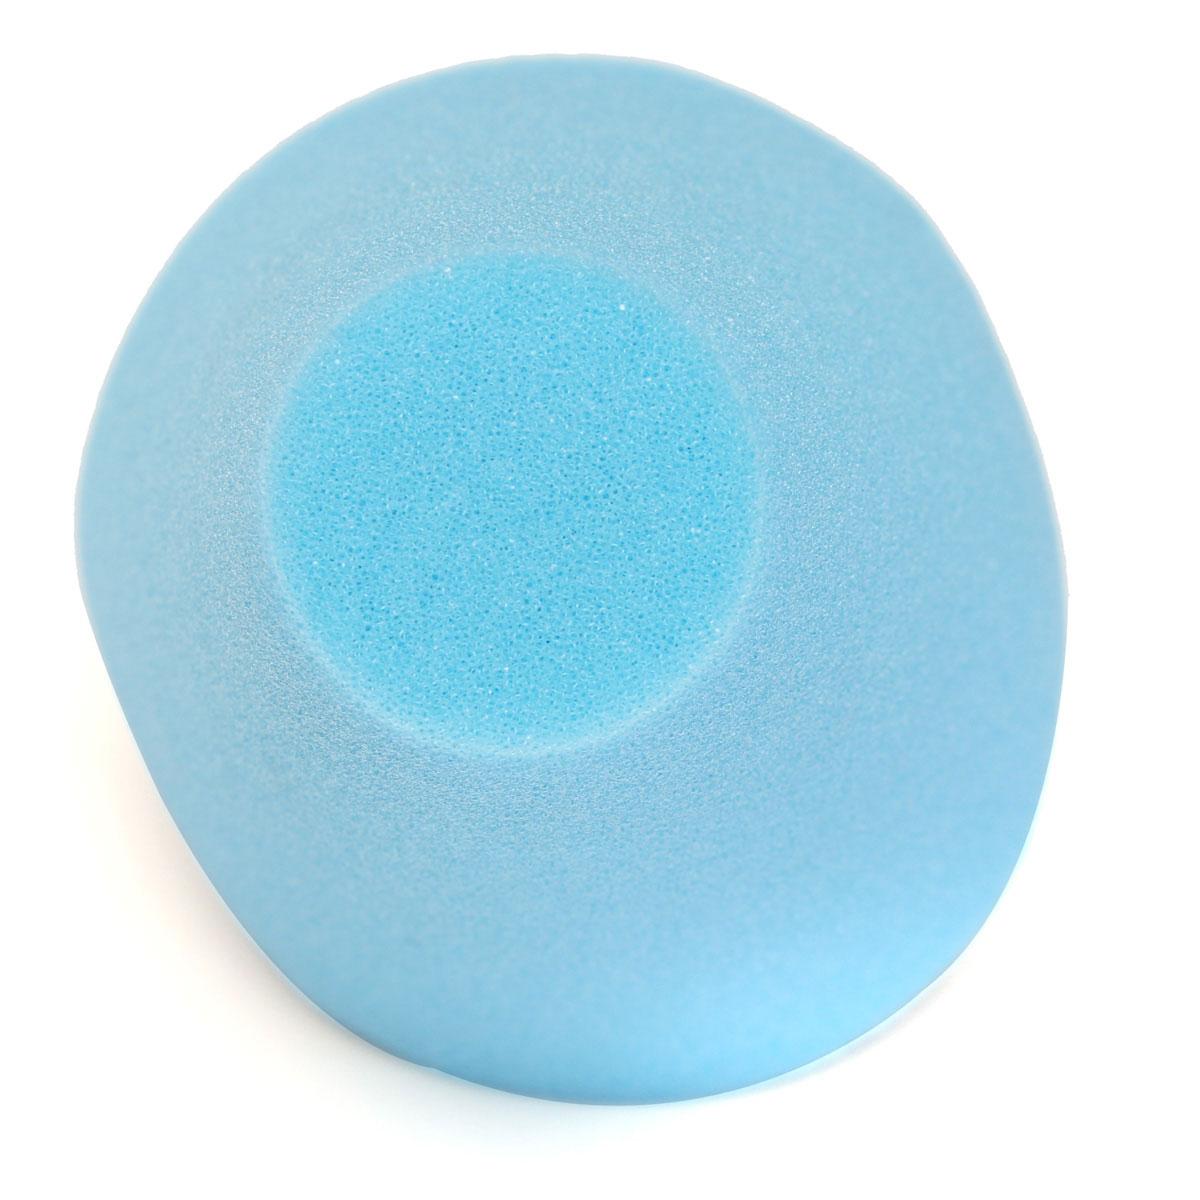 1x Sponge Cone Metal Polishing Foam Pad Wool Buffing: Polishing Foam Sponge Cone Metal Pad Car Wheel Hub Care